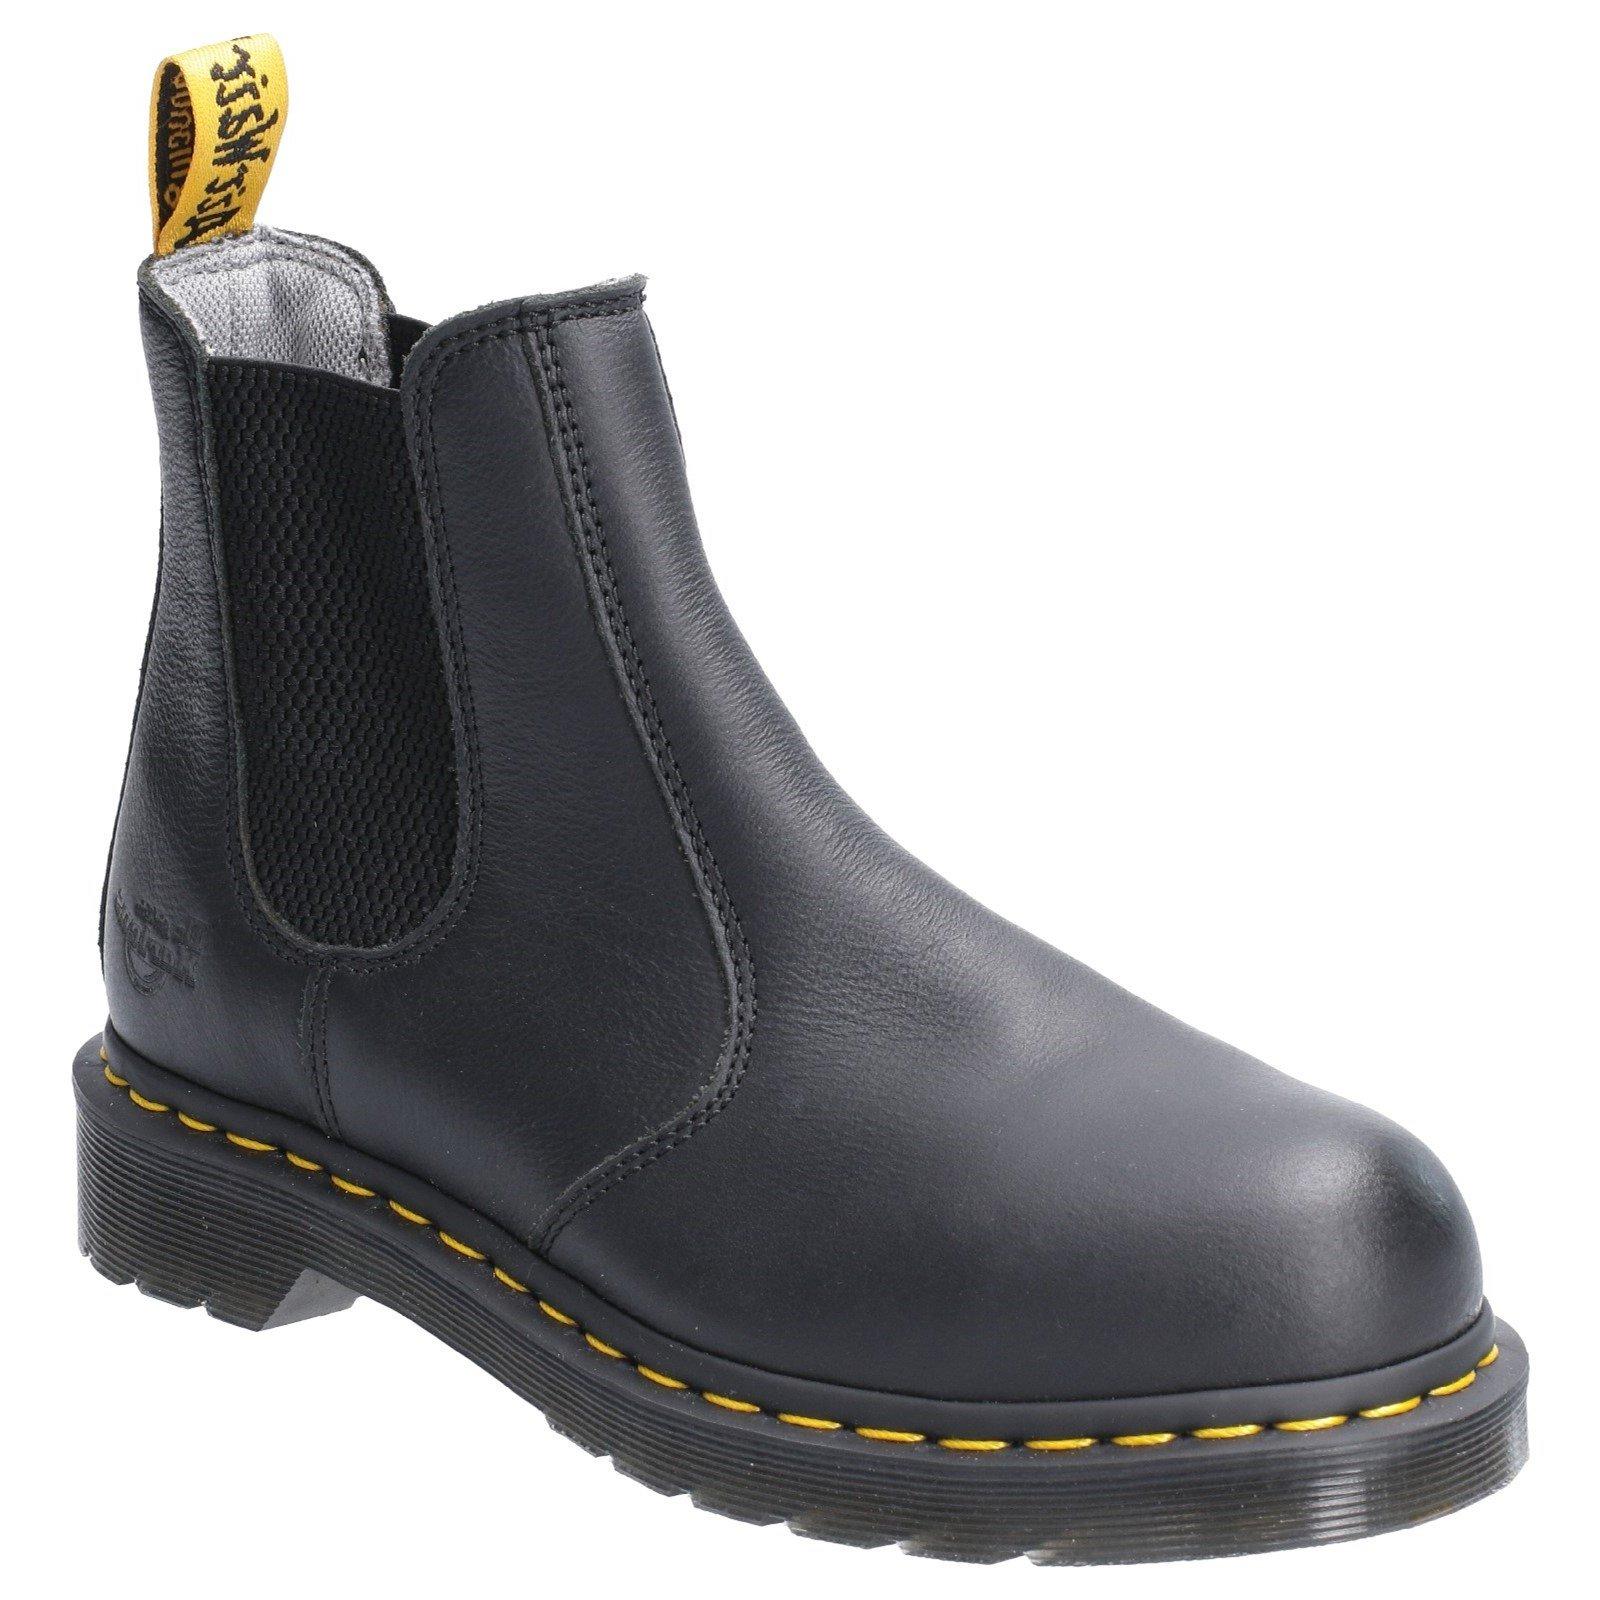 Dr Martens Women's Arbor Elastic Safety Boot Various Colours 29517 - Black 4